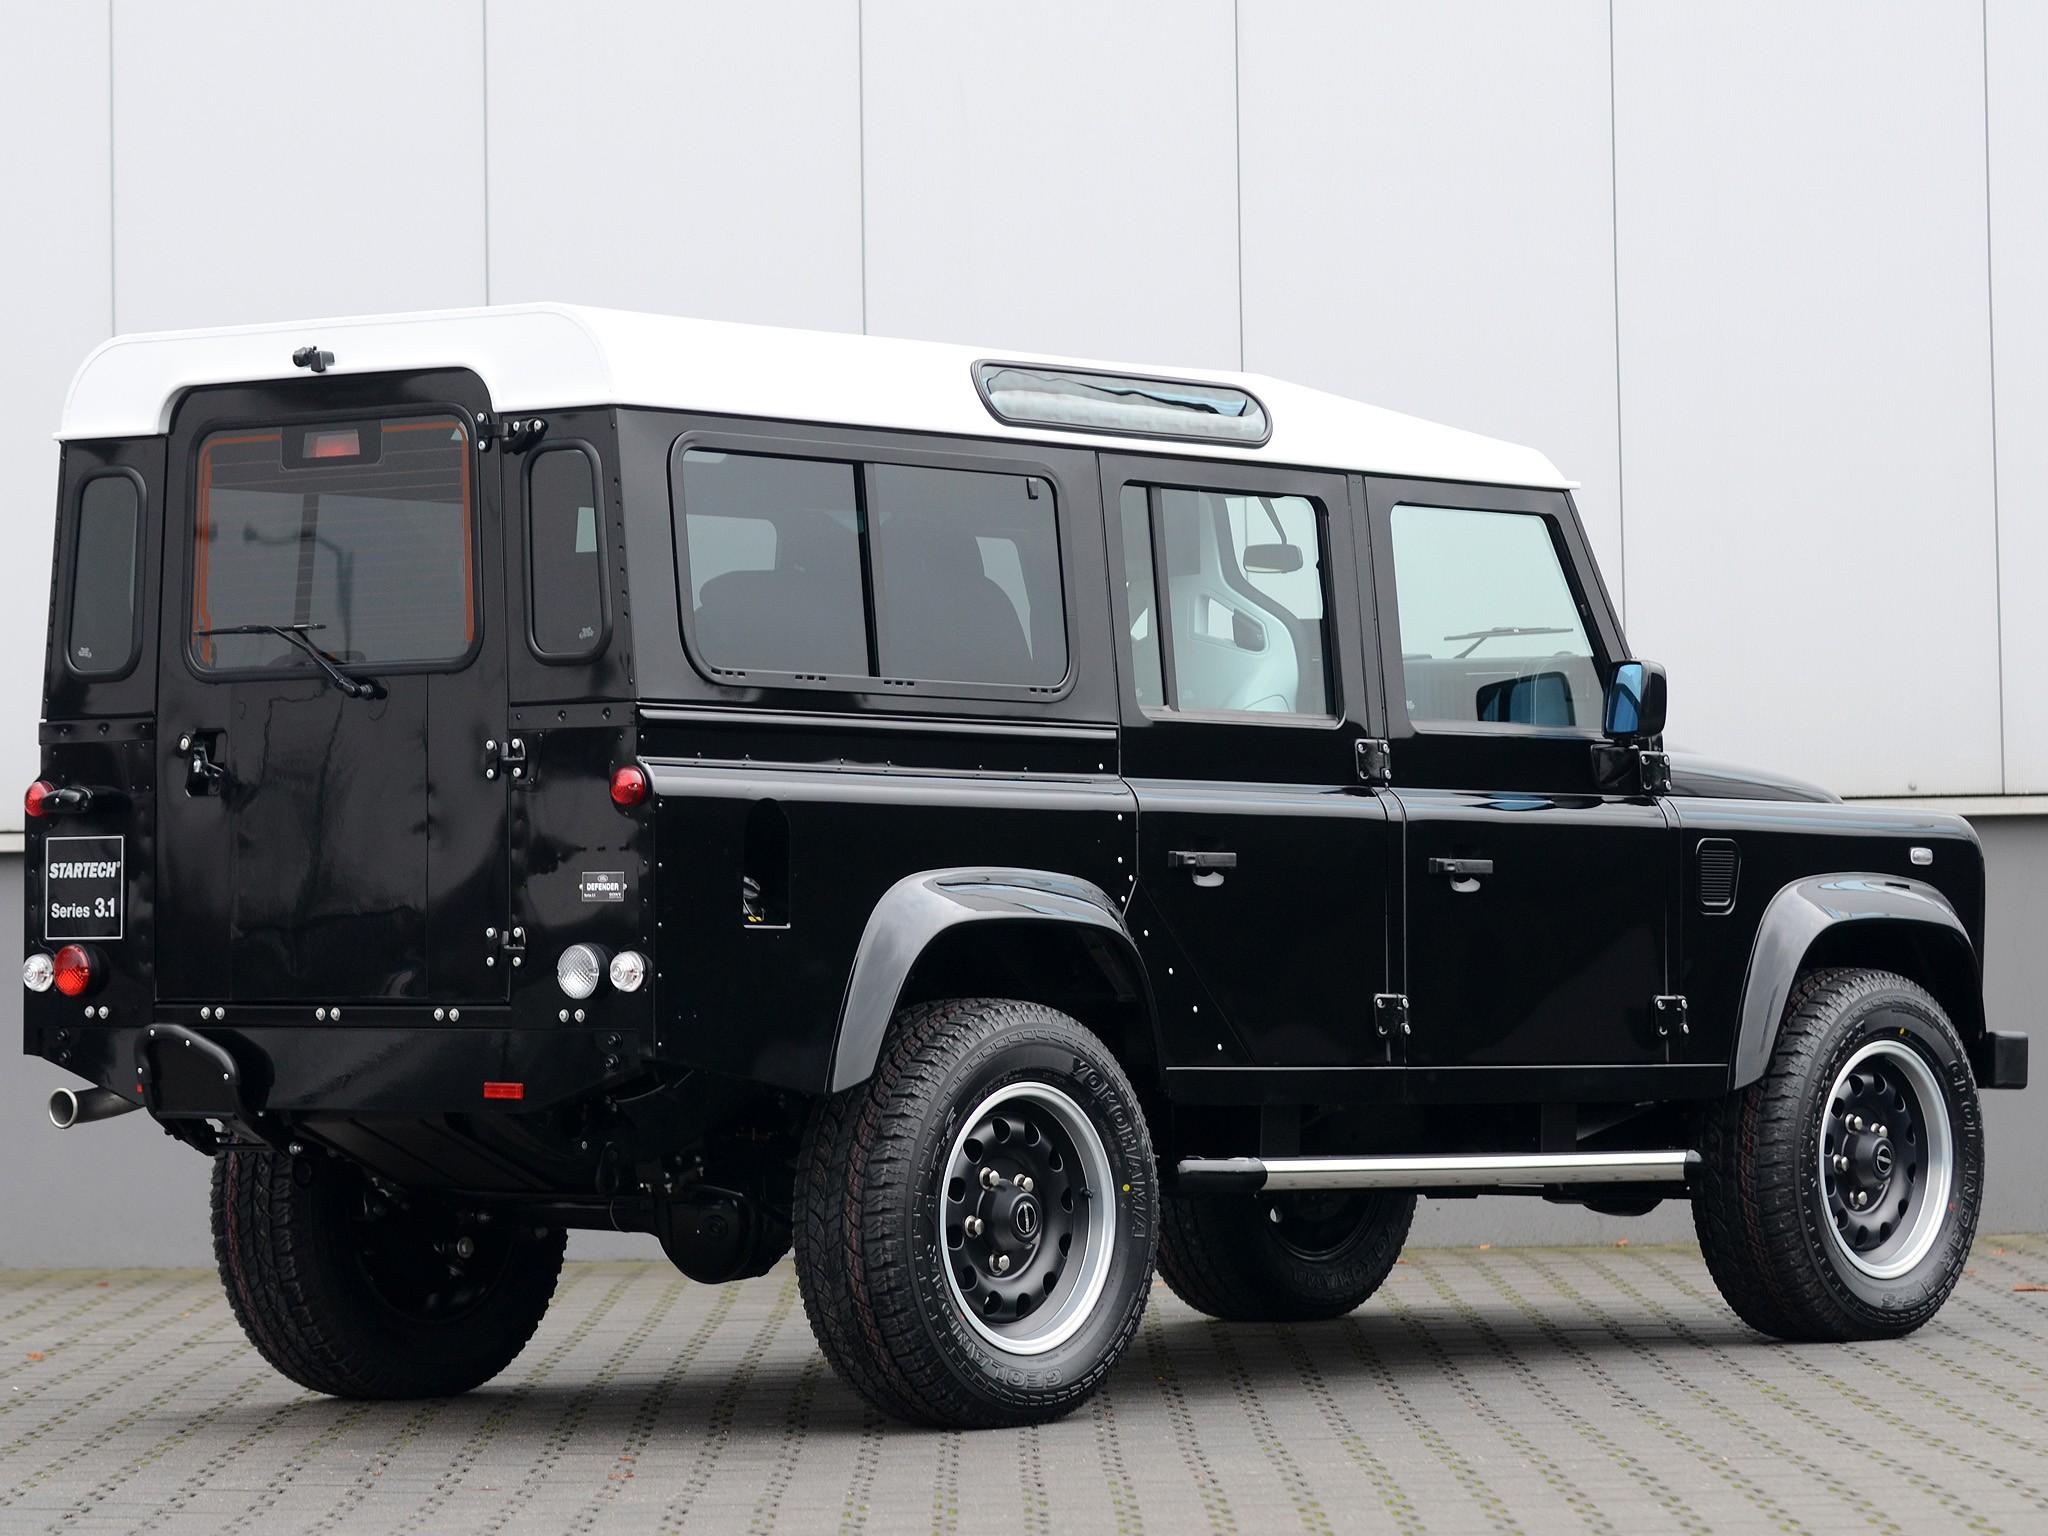 2012 Startech Land Rover Defender Series 3.1 Concept